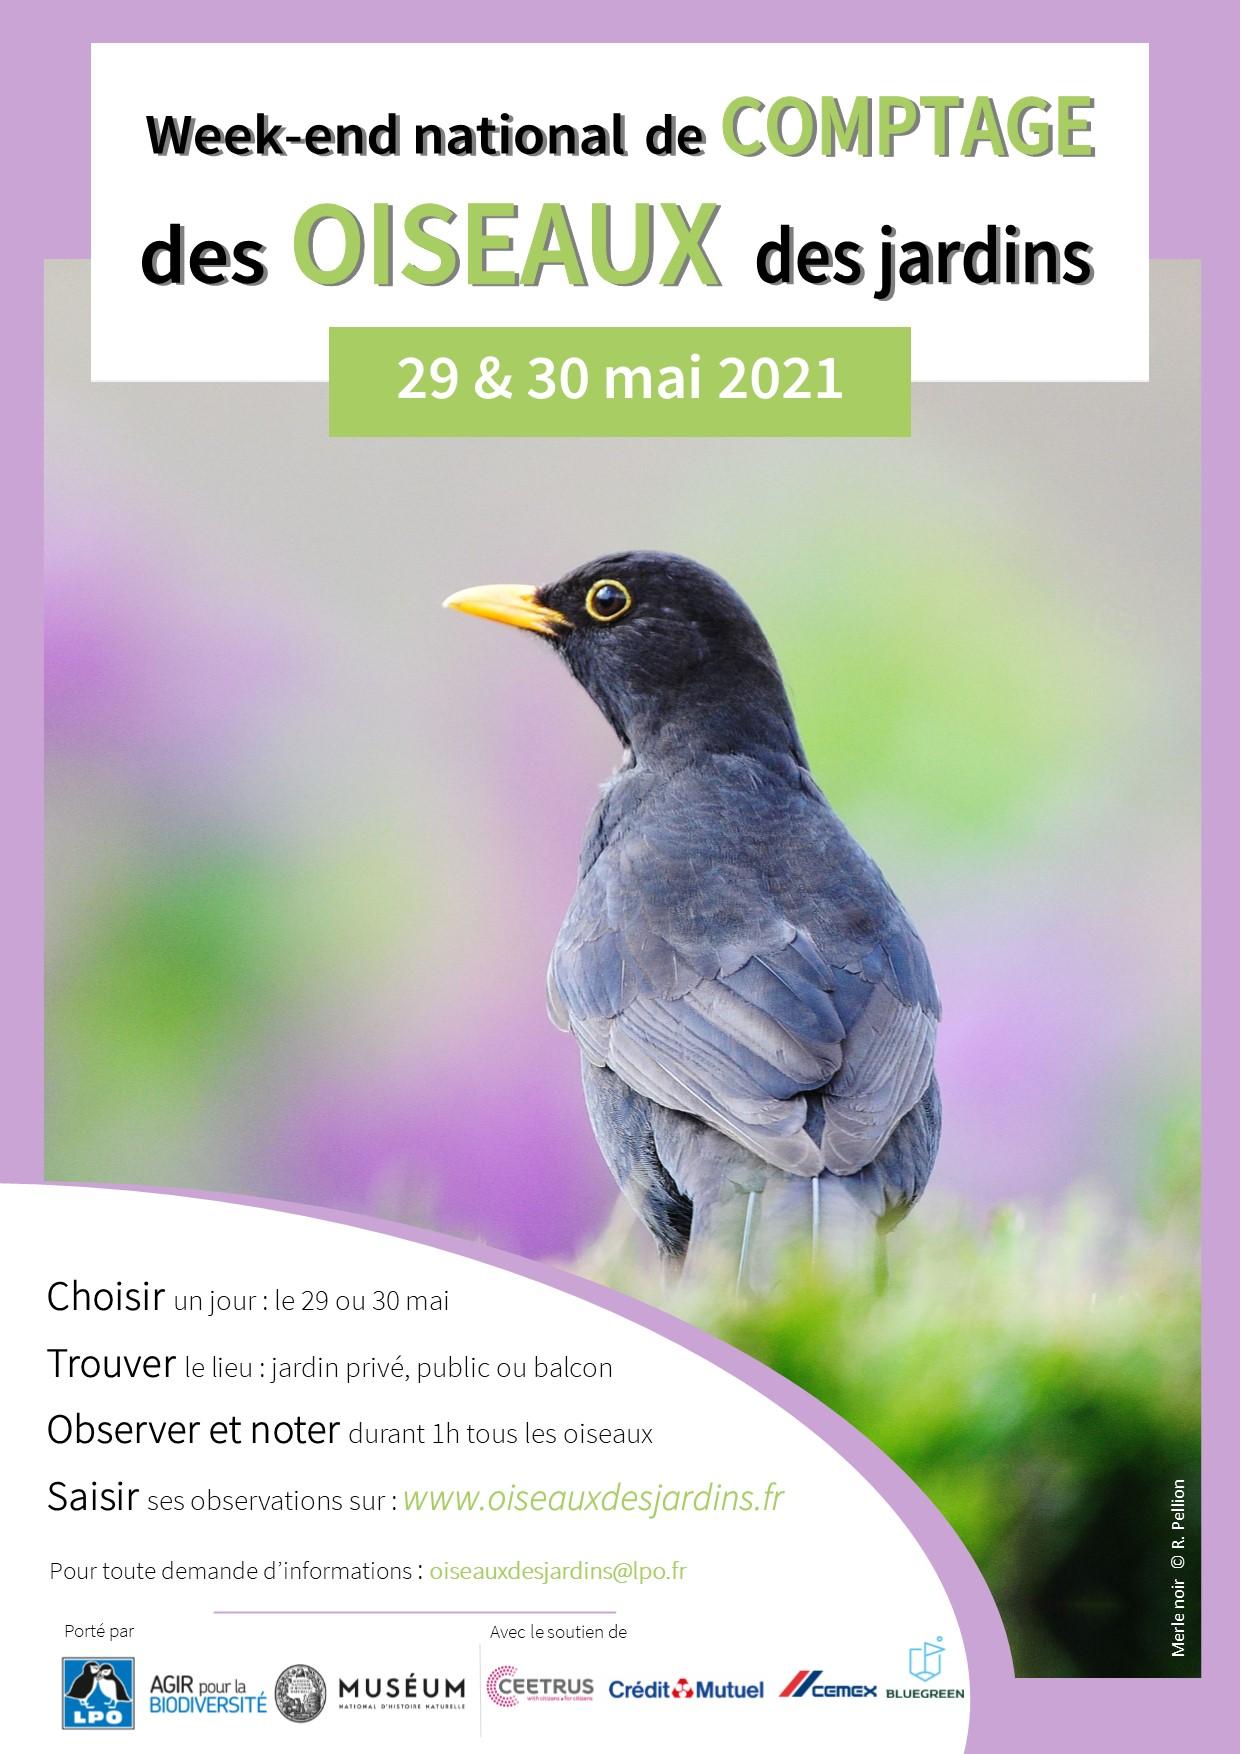 https://cdnfiles1.biolovision.net/www.oiseauxdesjardins.fr/userfiles/Affichecomptagemai2021V001.jpg